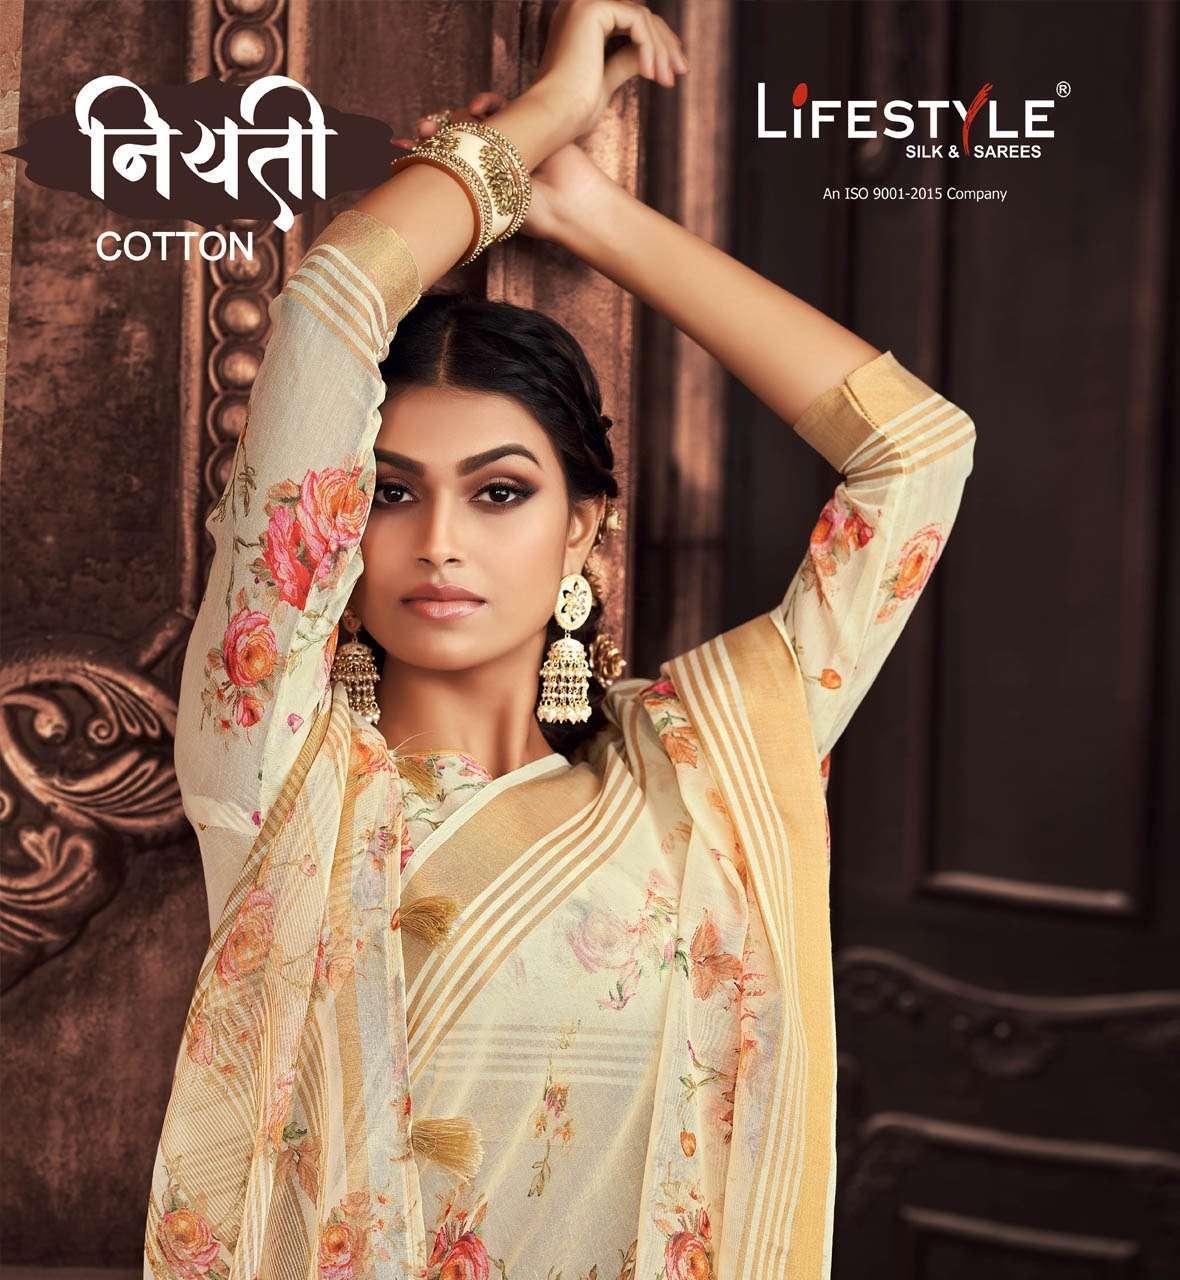 Lifestyle Niyati Cotton Linen cotton printed sarees collection